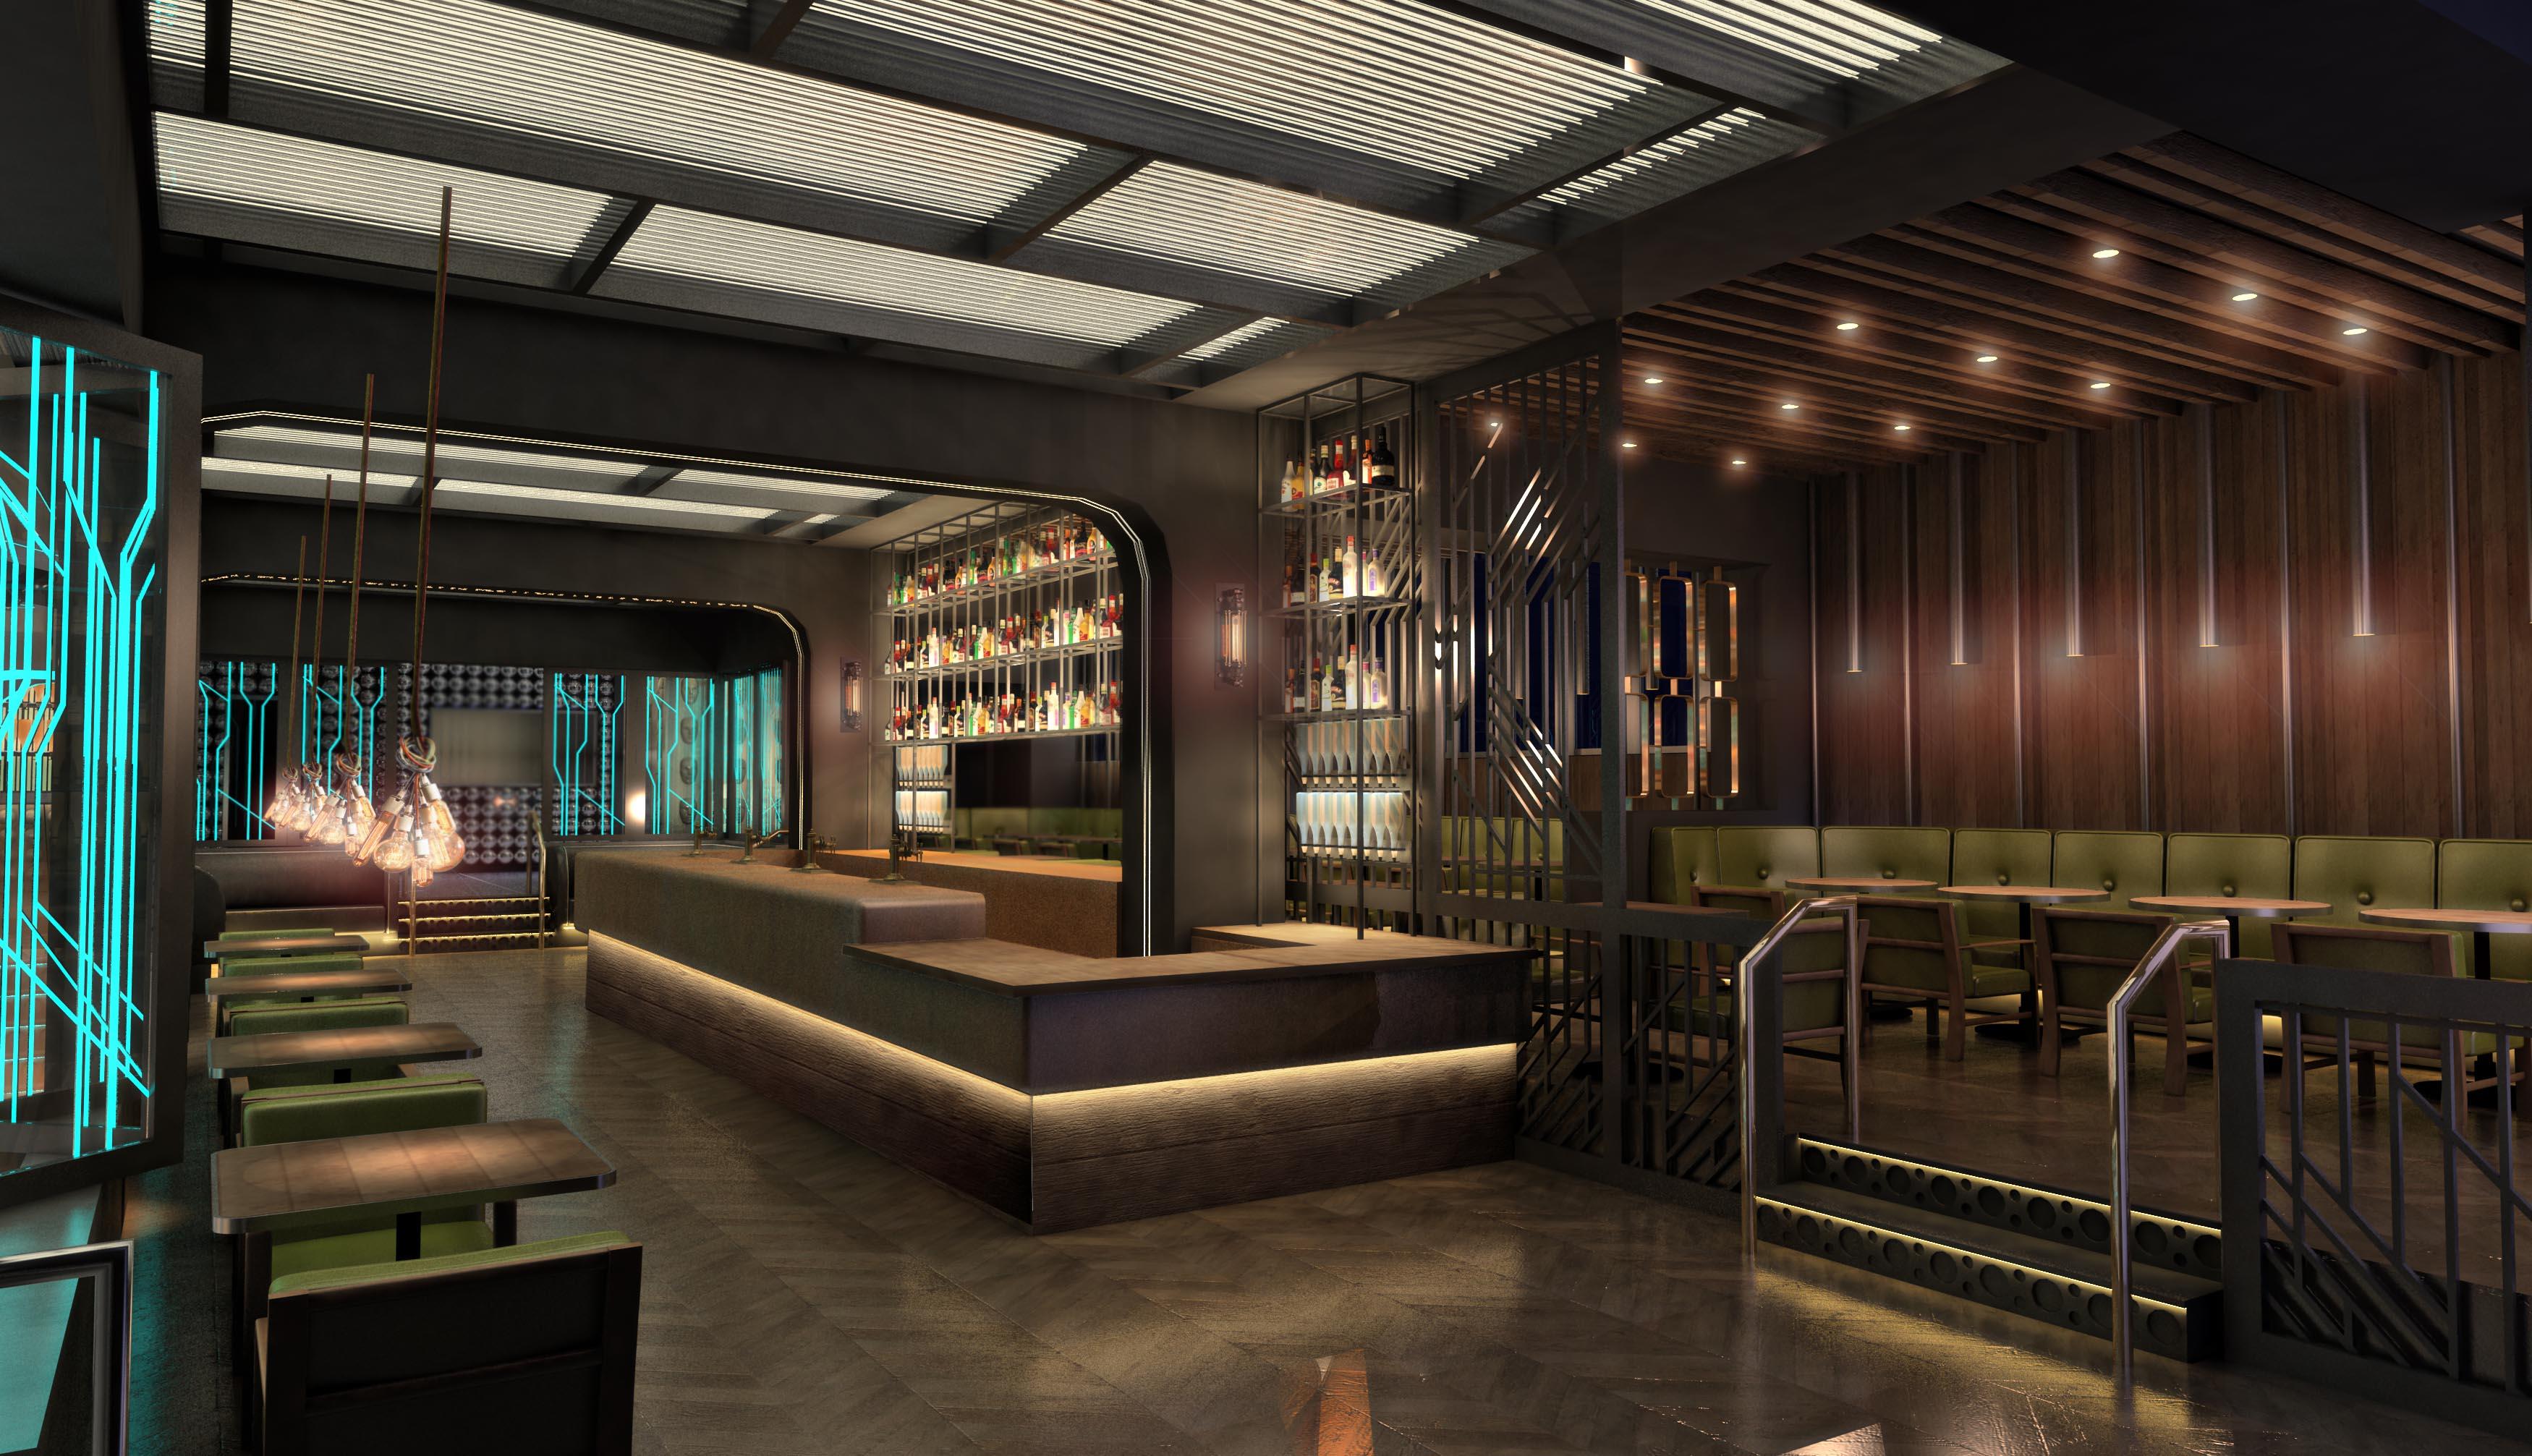 Snobs Birmingham Nightclub Restaurant Lounge Designers ...